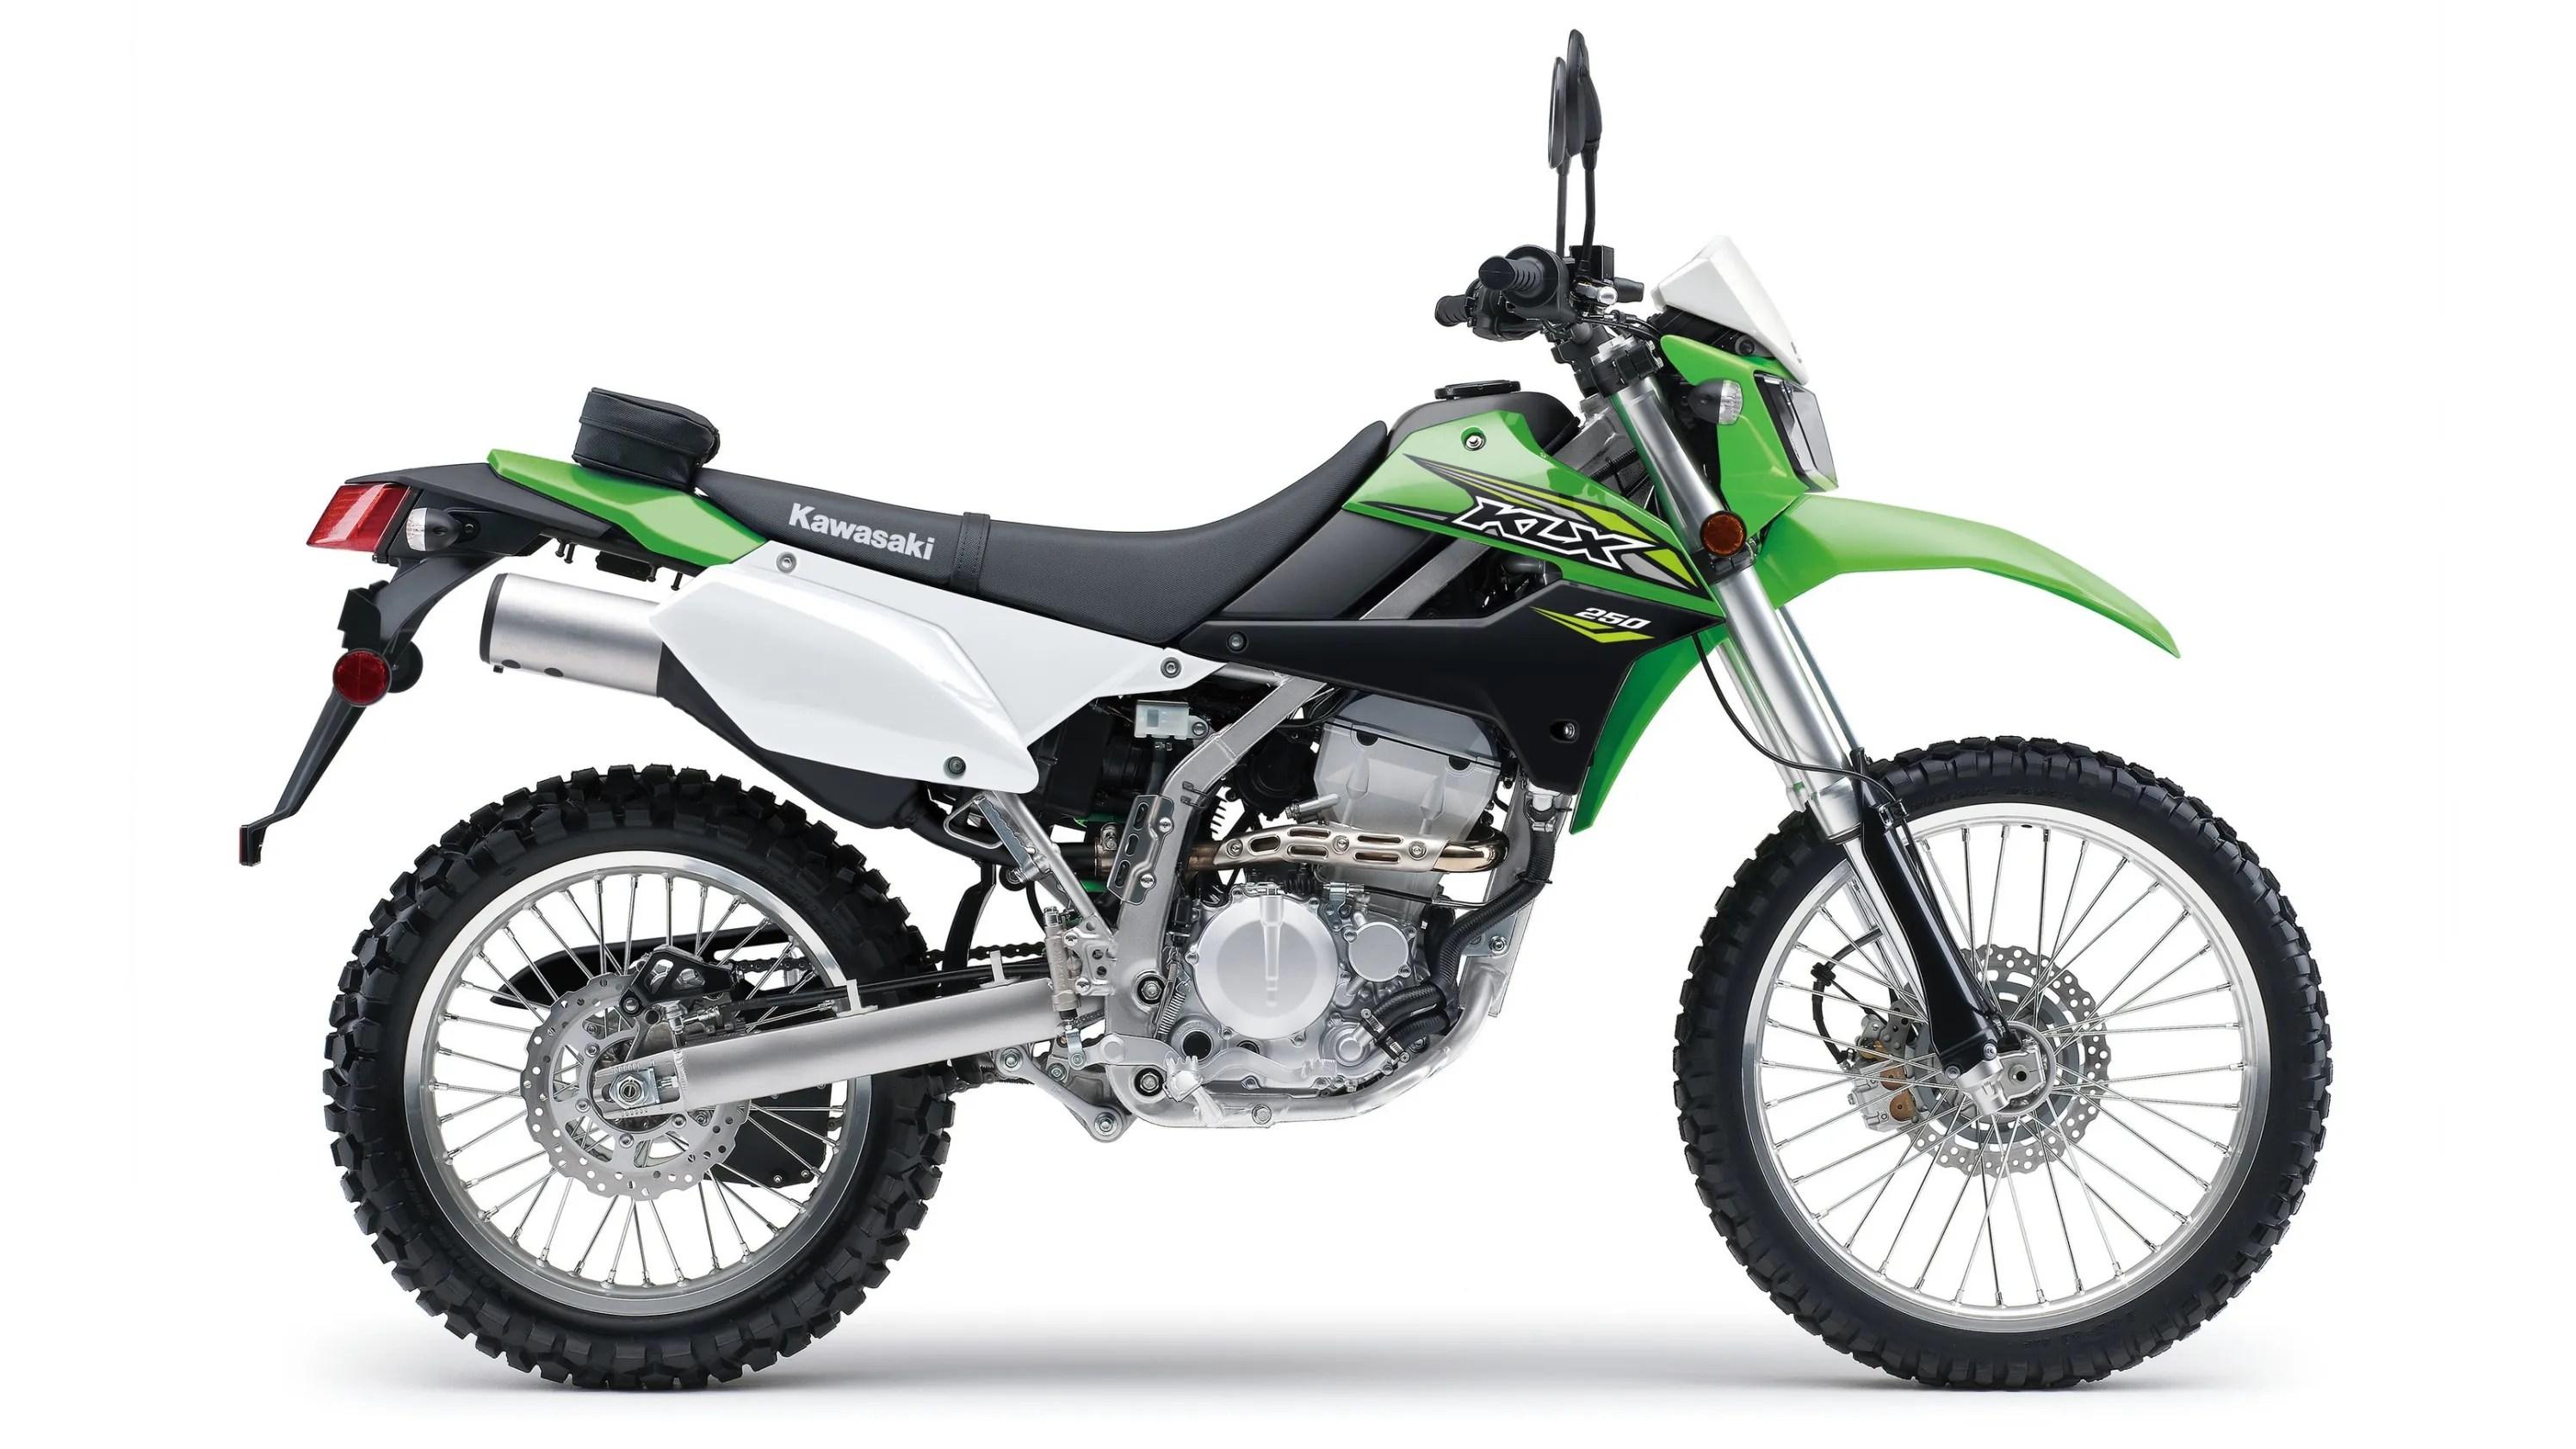 Kawasaki Klx 230 Price Philippines